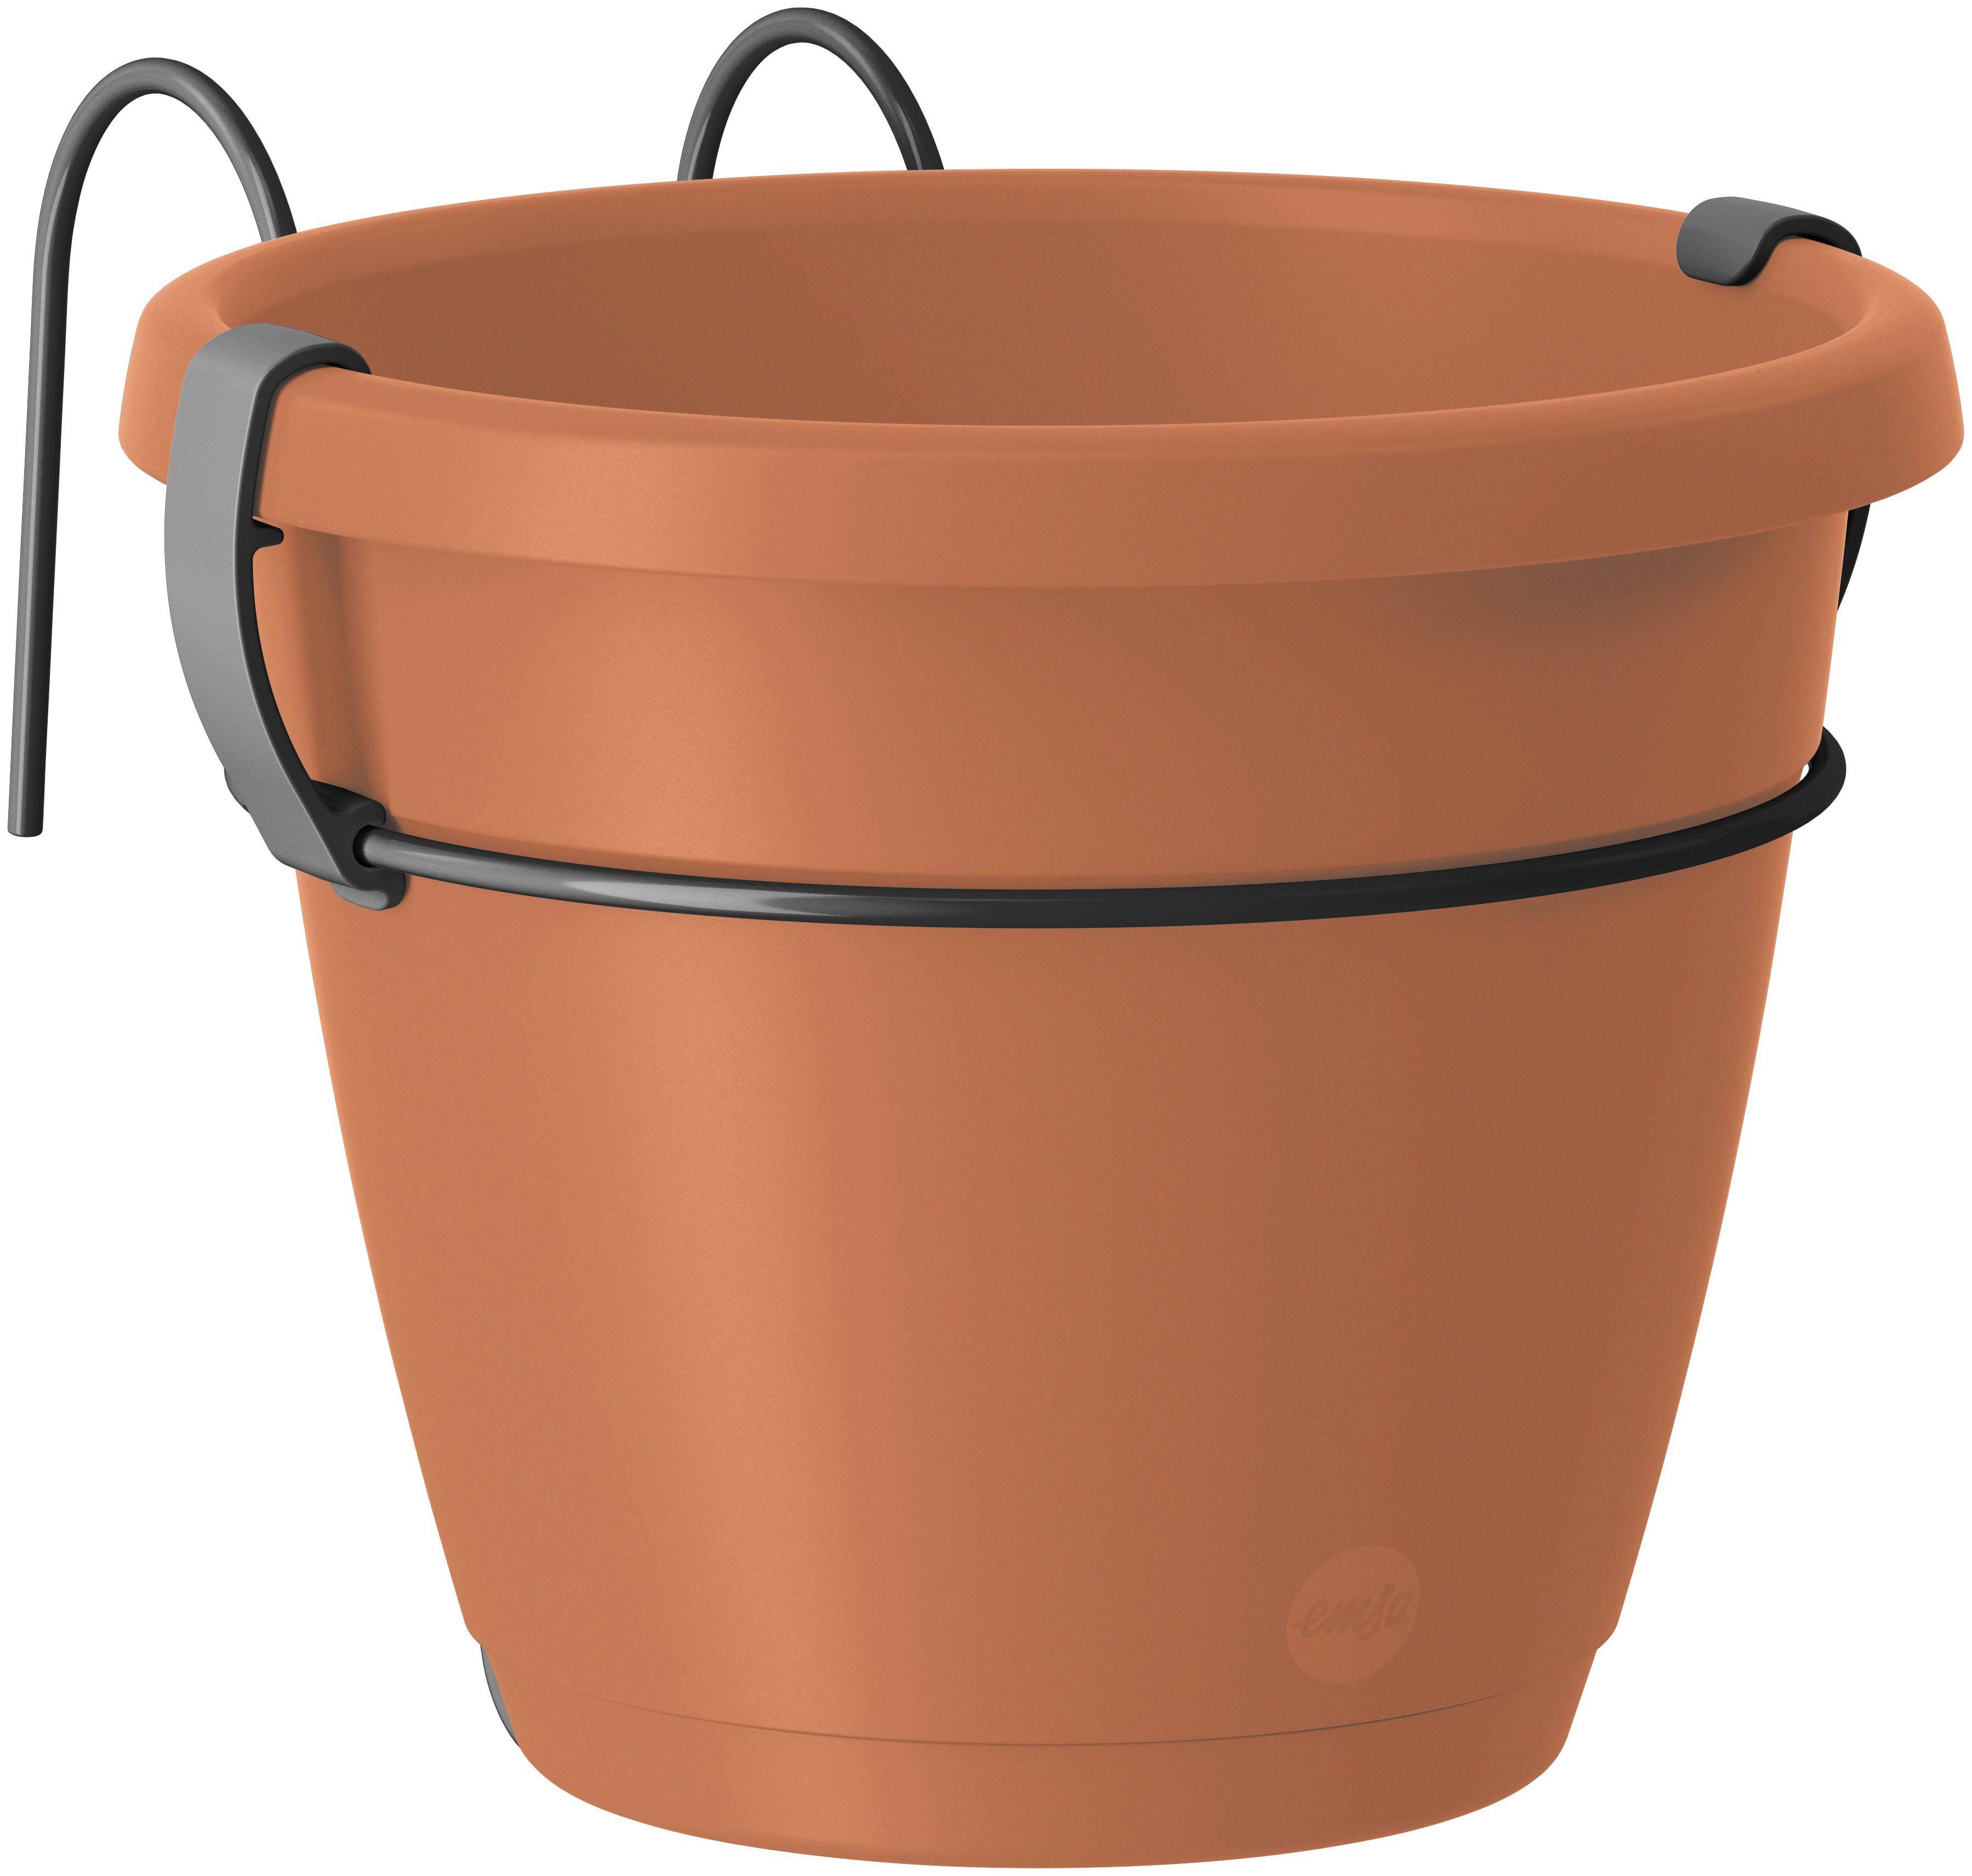 EMSA Set: Blumenkasten »CITY Hängetopf«, 3 tlg., 2x Ø 20 cm und 1x Ø 40 cm